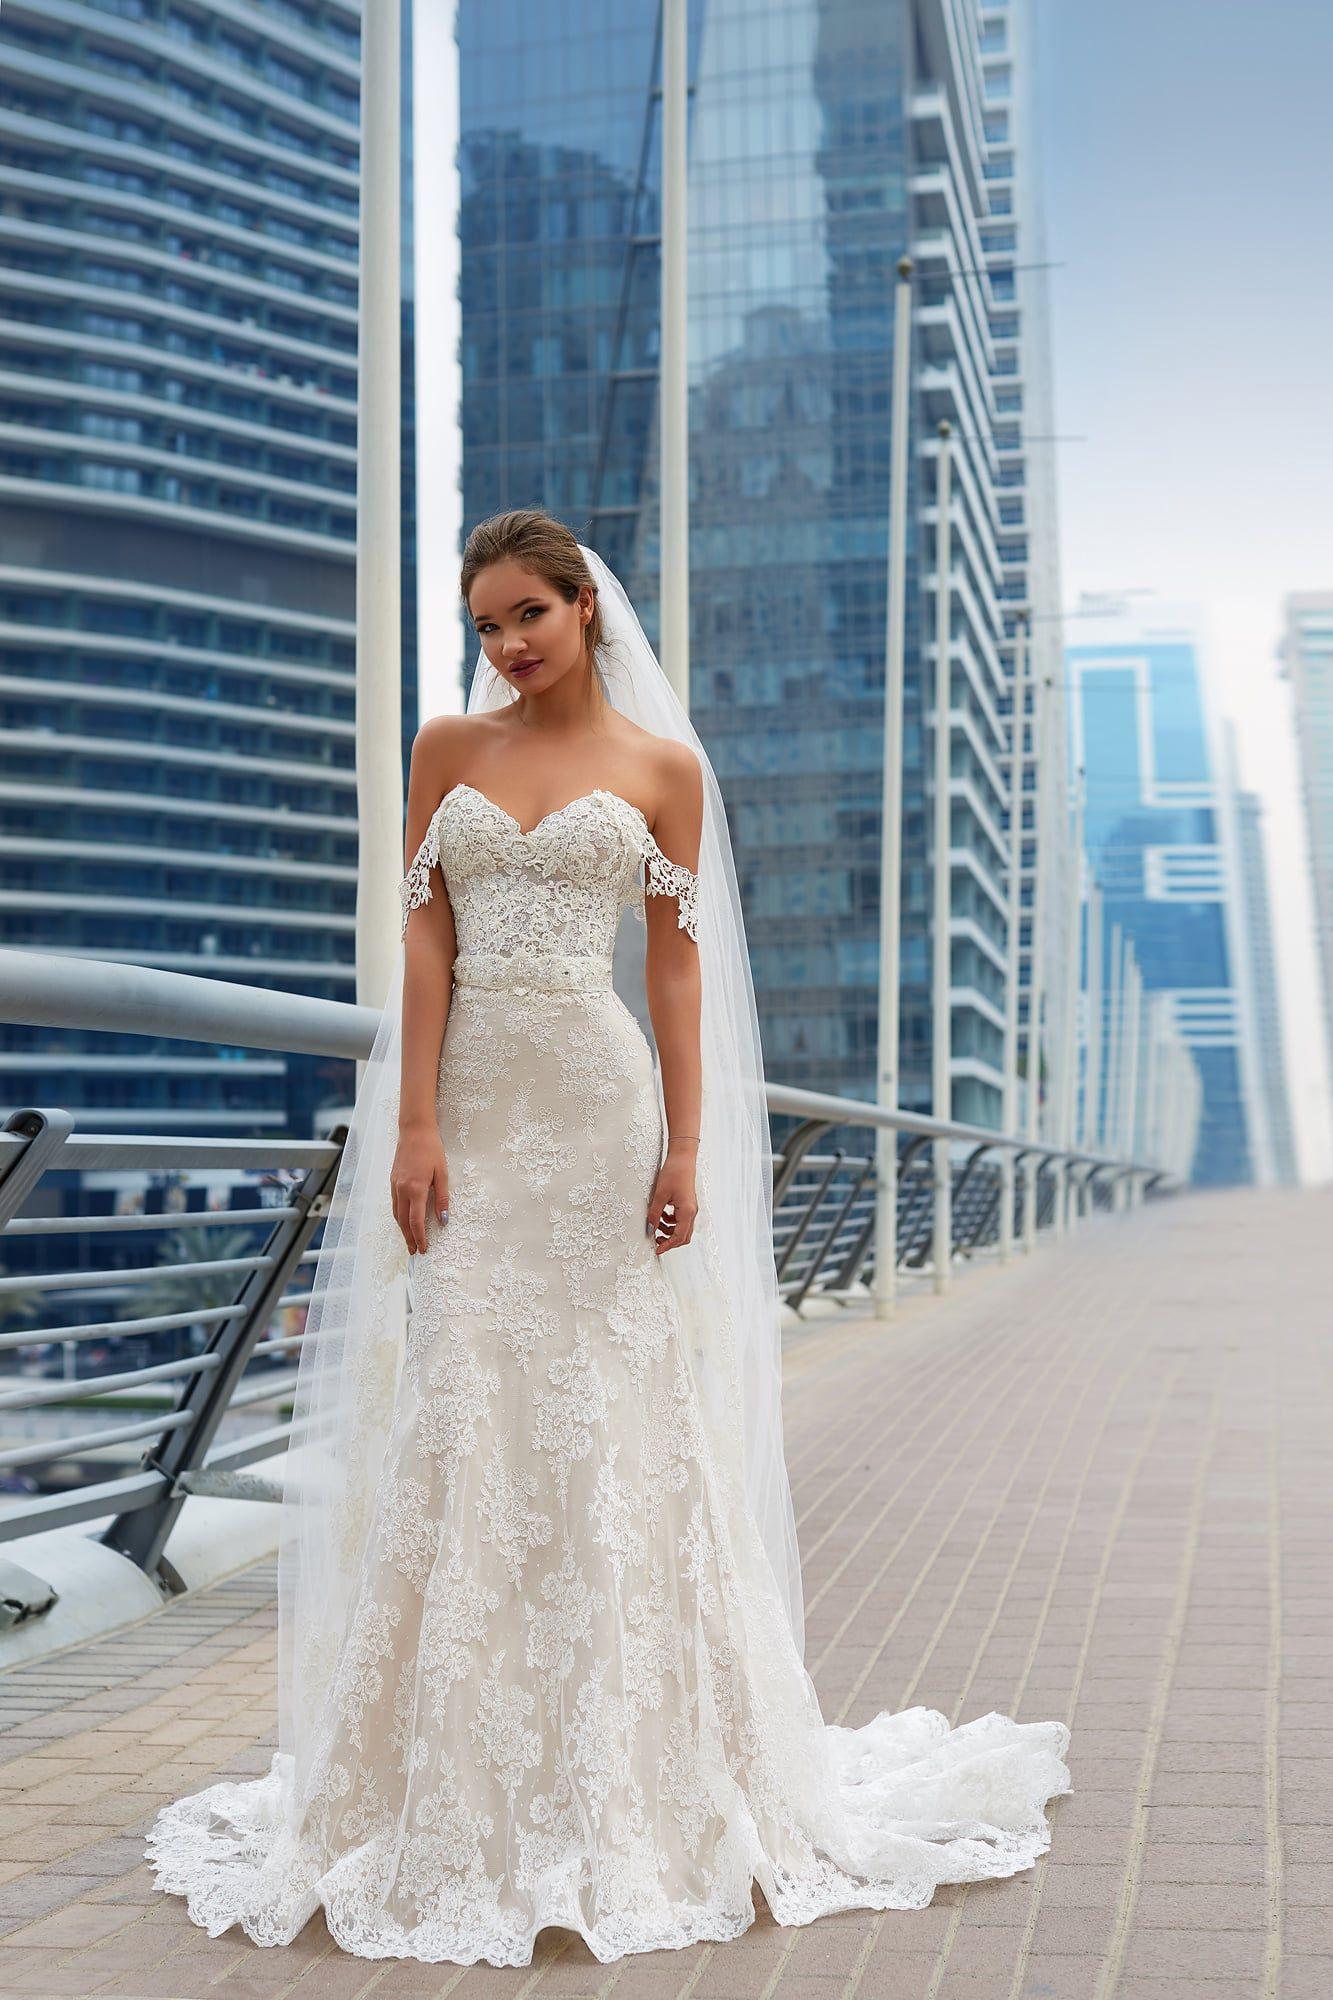 Wedding Dress LOREIN.Style 2018. LANESTA Couture. Charmé Gaby Bridal ...